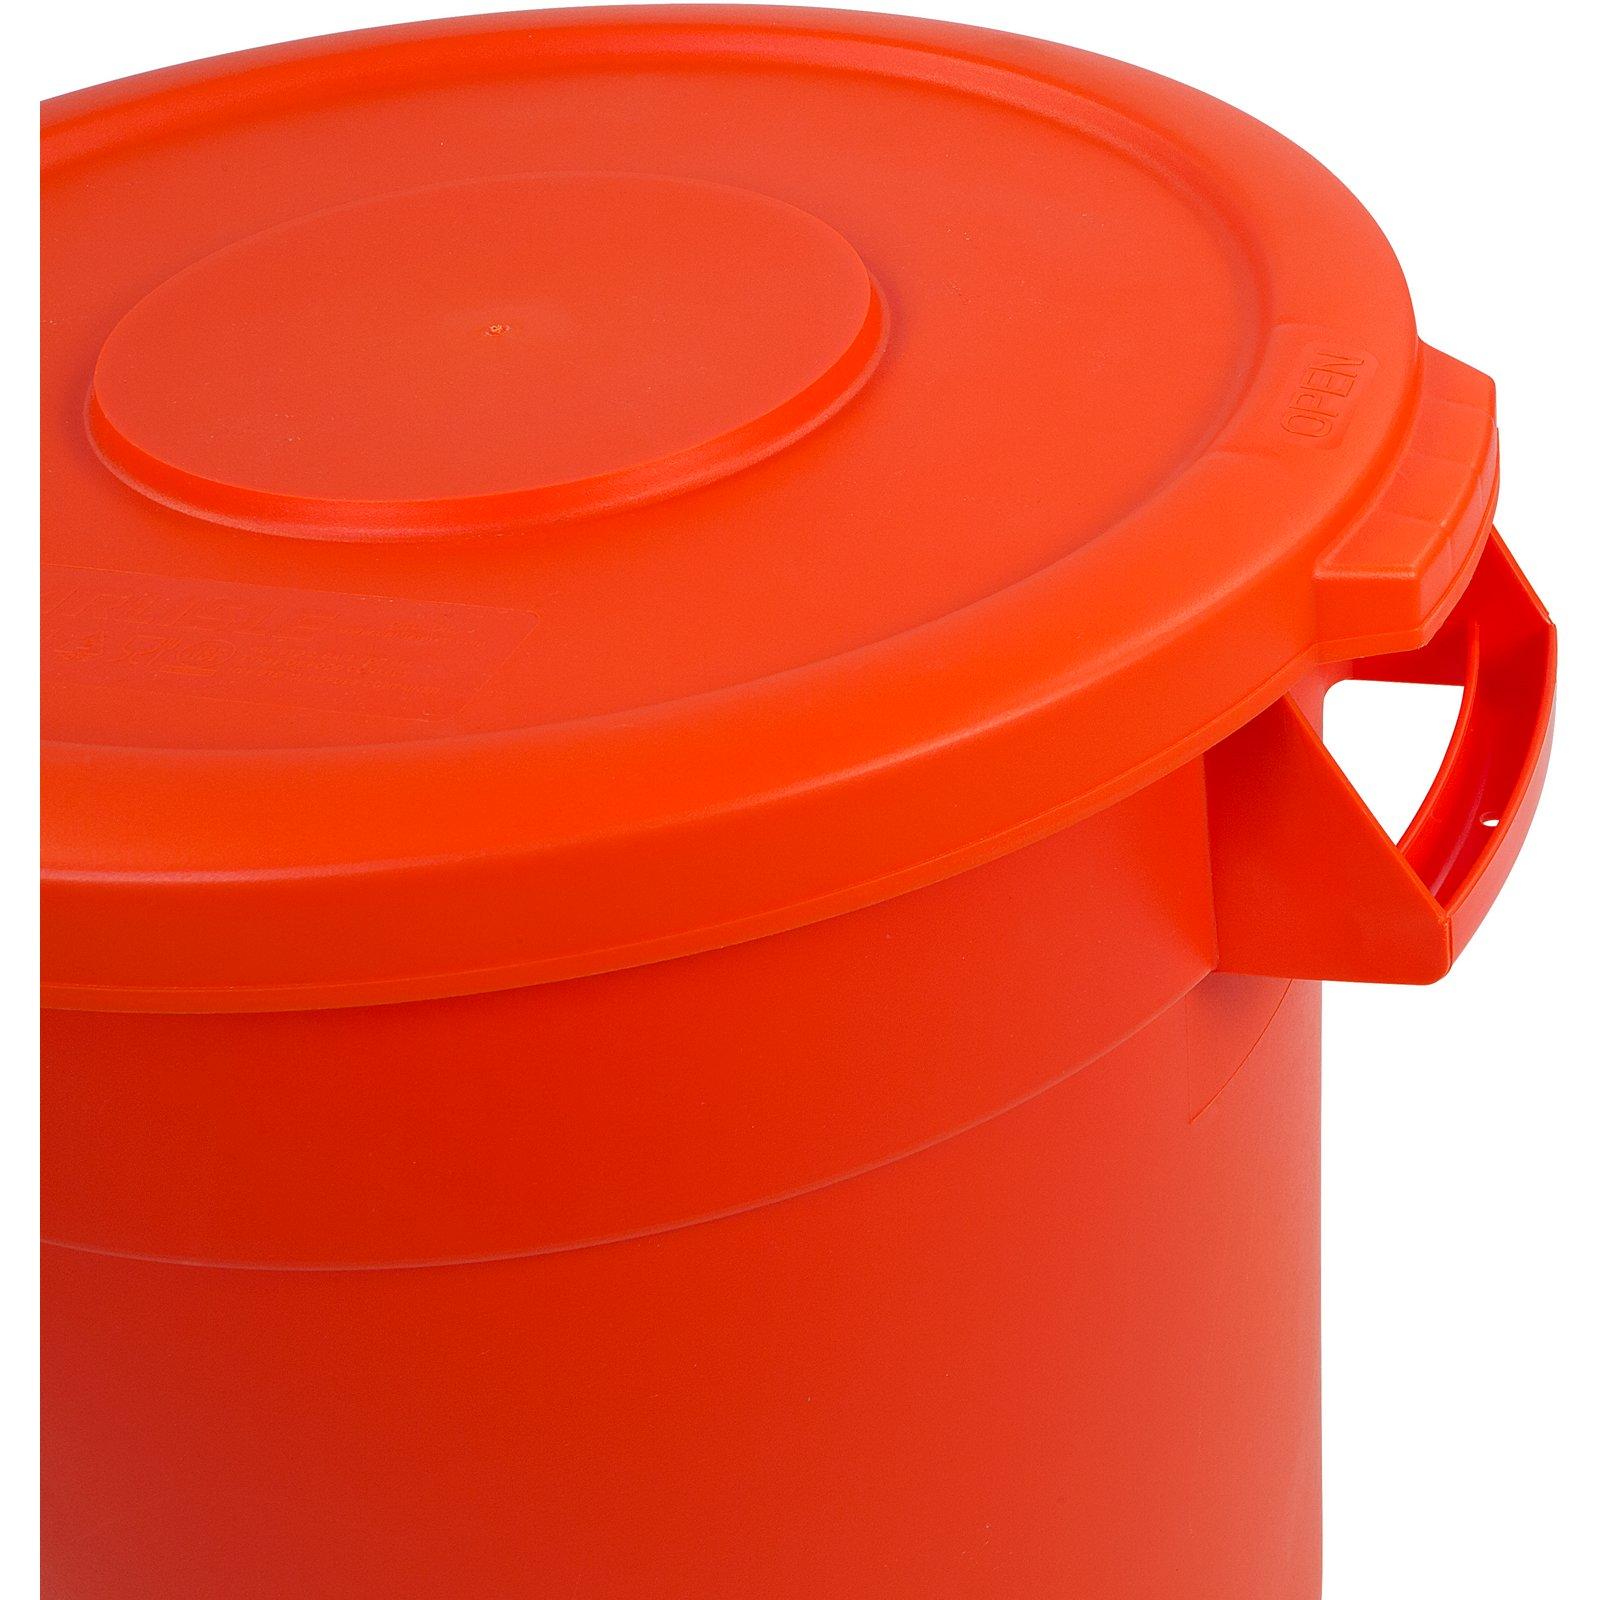 34101024 - Bronco™ Round Waste Bin Food Container 10 Gallon - Orange  sc 1 st  Carlisle FoodService Products & 34101024 - Bronco™ Round Waste Bin Food Container 10 Gallon - Orange ...